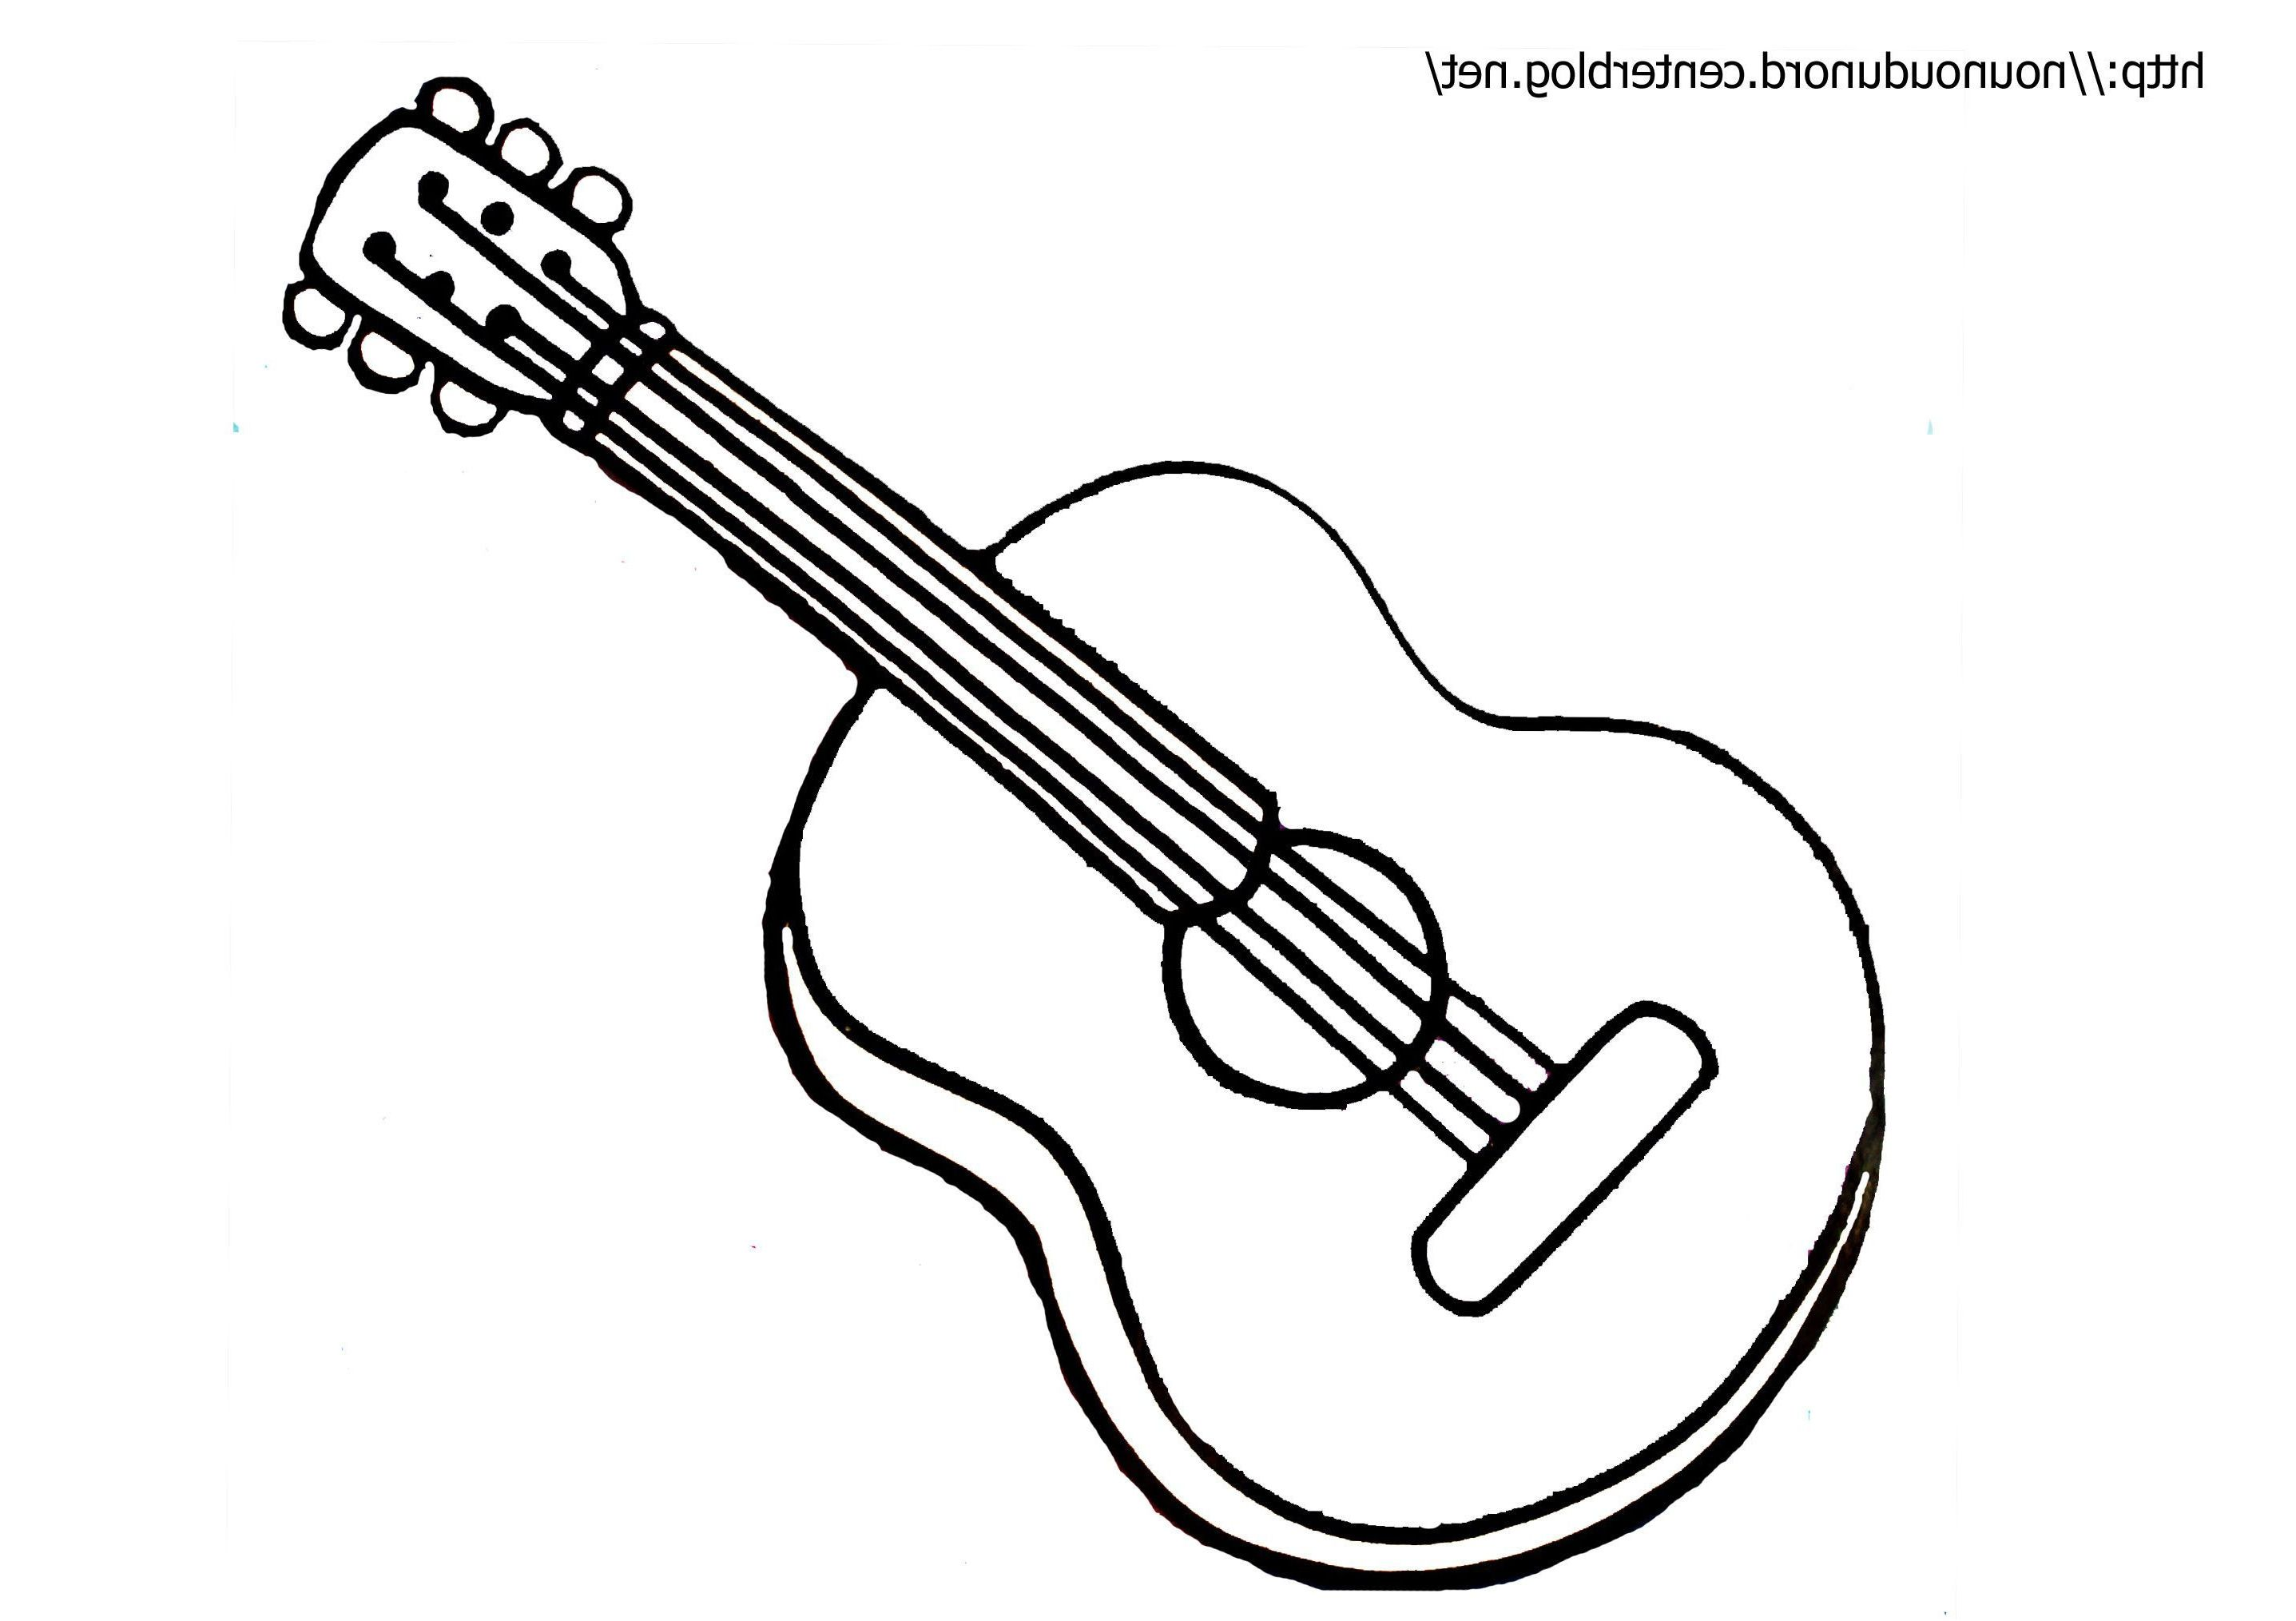 10 Fabuleux Coloriage Guitare Stock Coloriage Guitare Coloriage Musique Dessin Instrument De Musique